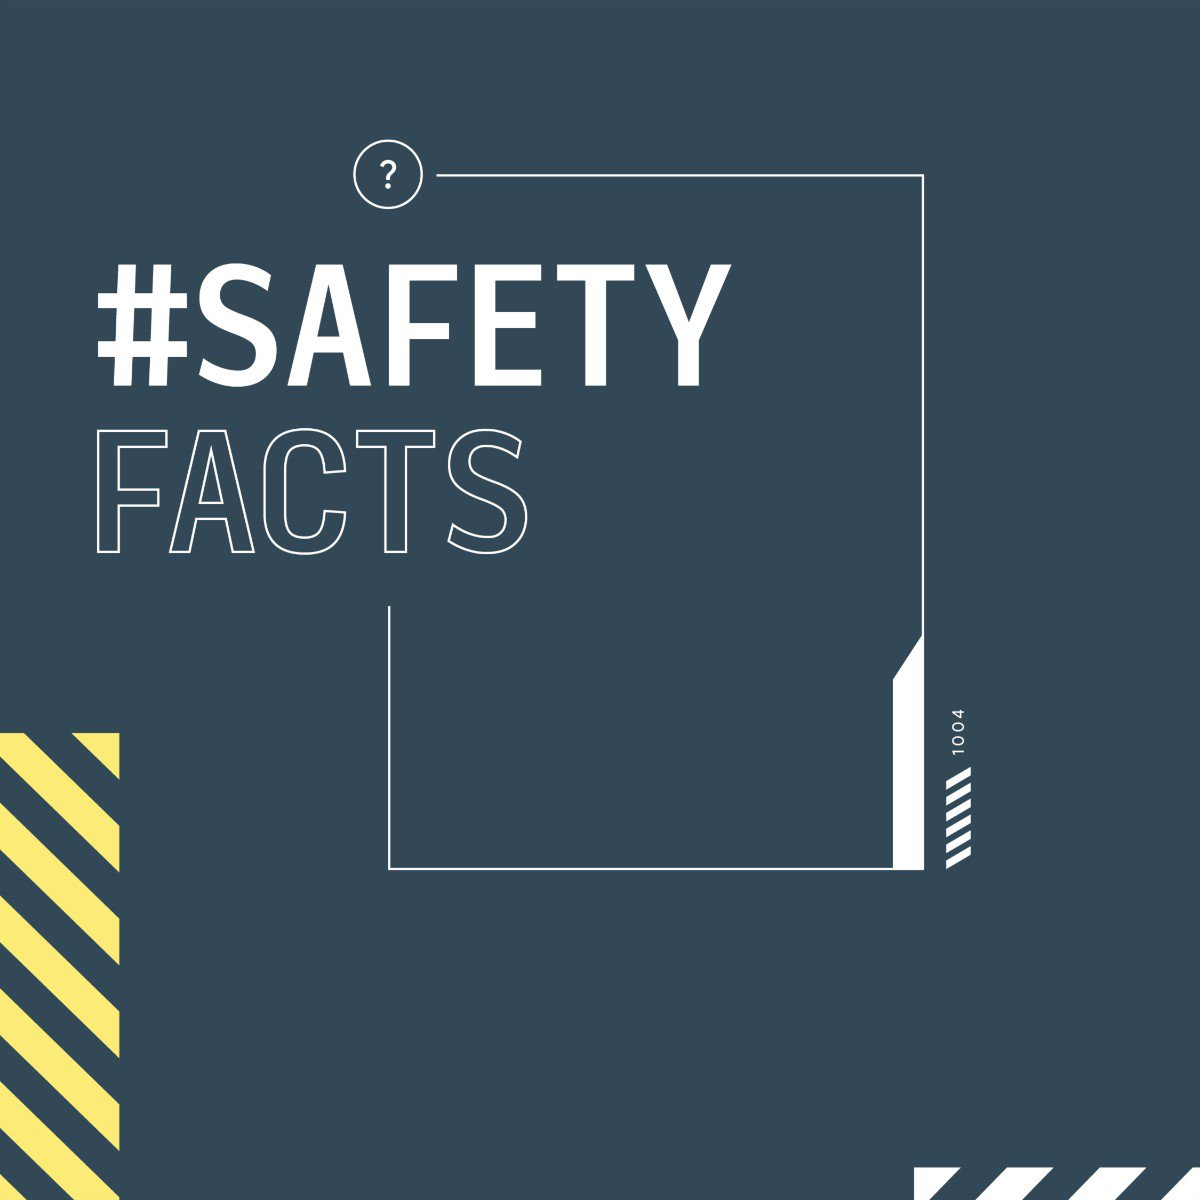 RT @EuroNCAP: #SafetyFacts  #SeatbeltsSaveLives  ⭐️ https://t.co/XTs35CvDQG ⭐️ https://t.co/dg4xv2koGo